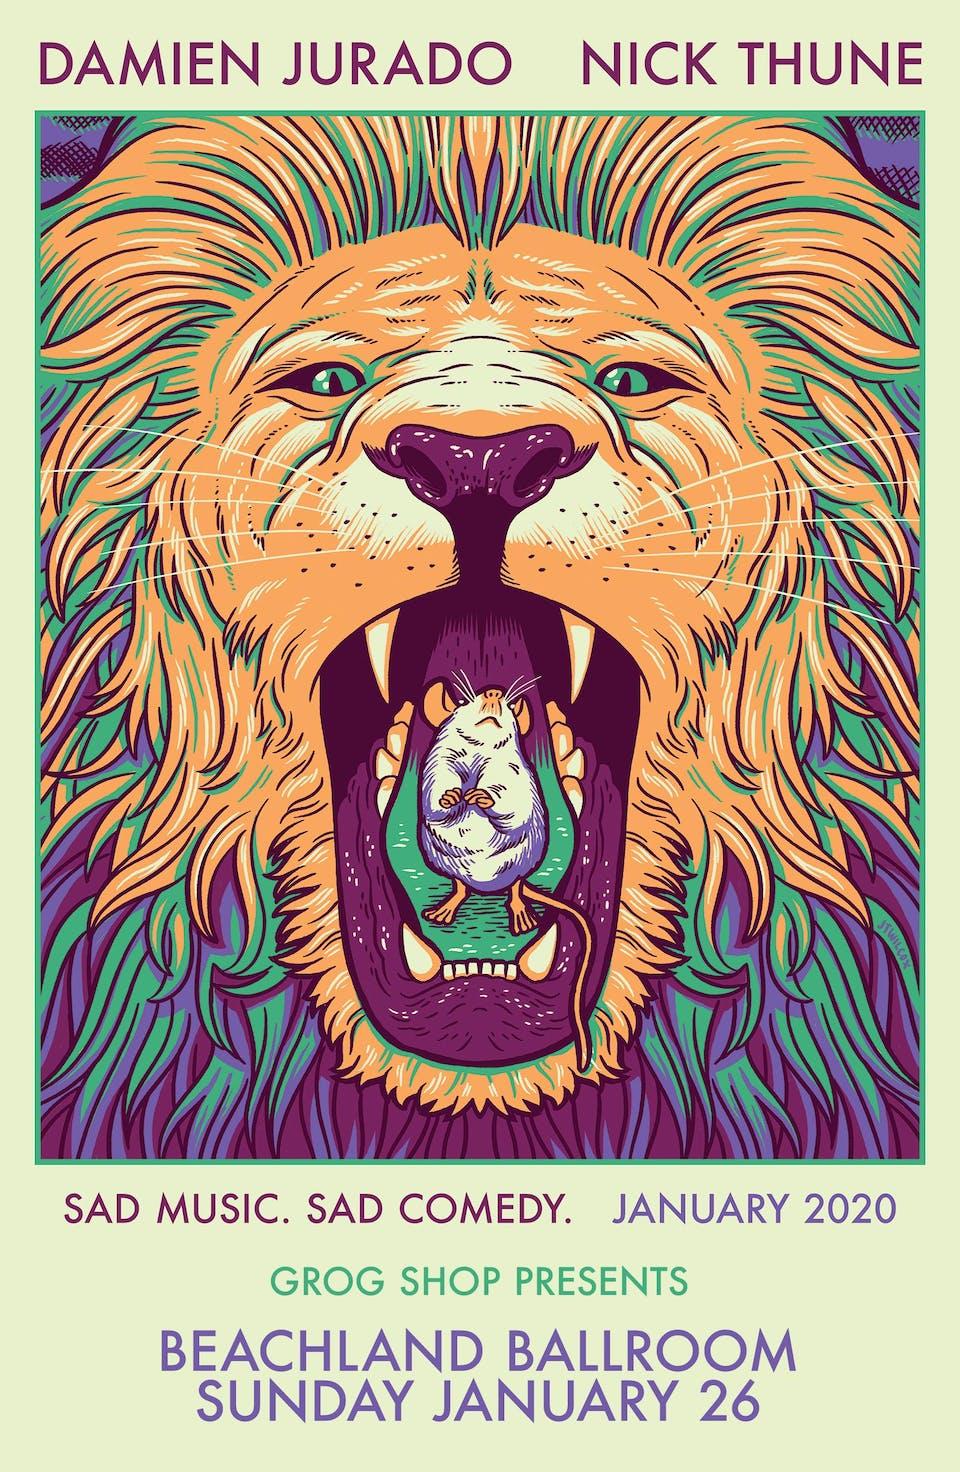 Damien Jurado and Nick Thune - Sad Music, Sad Comedy